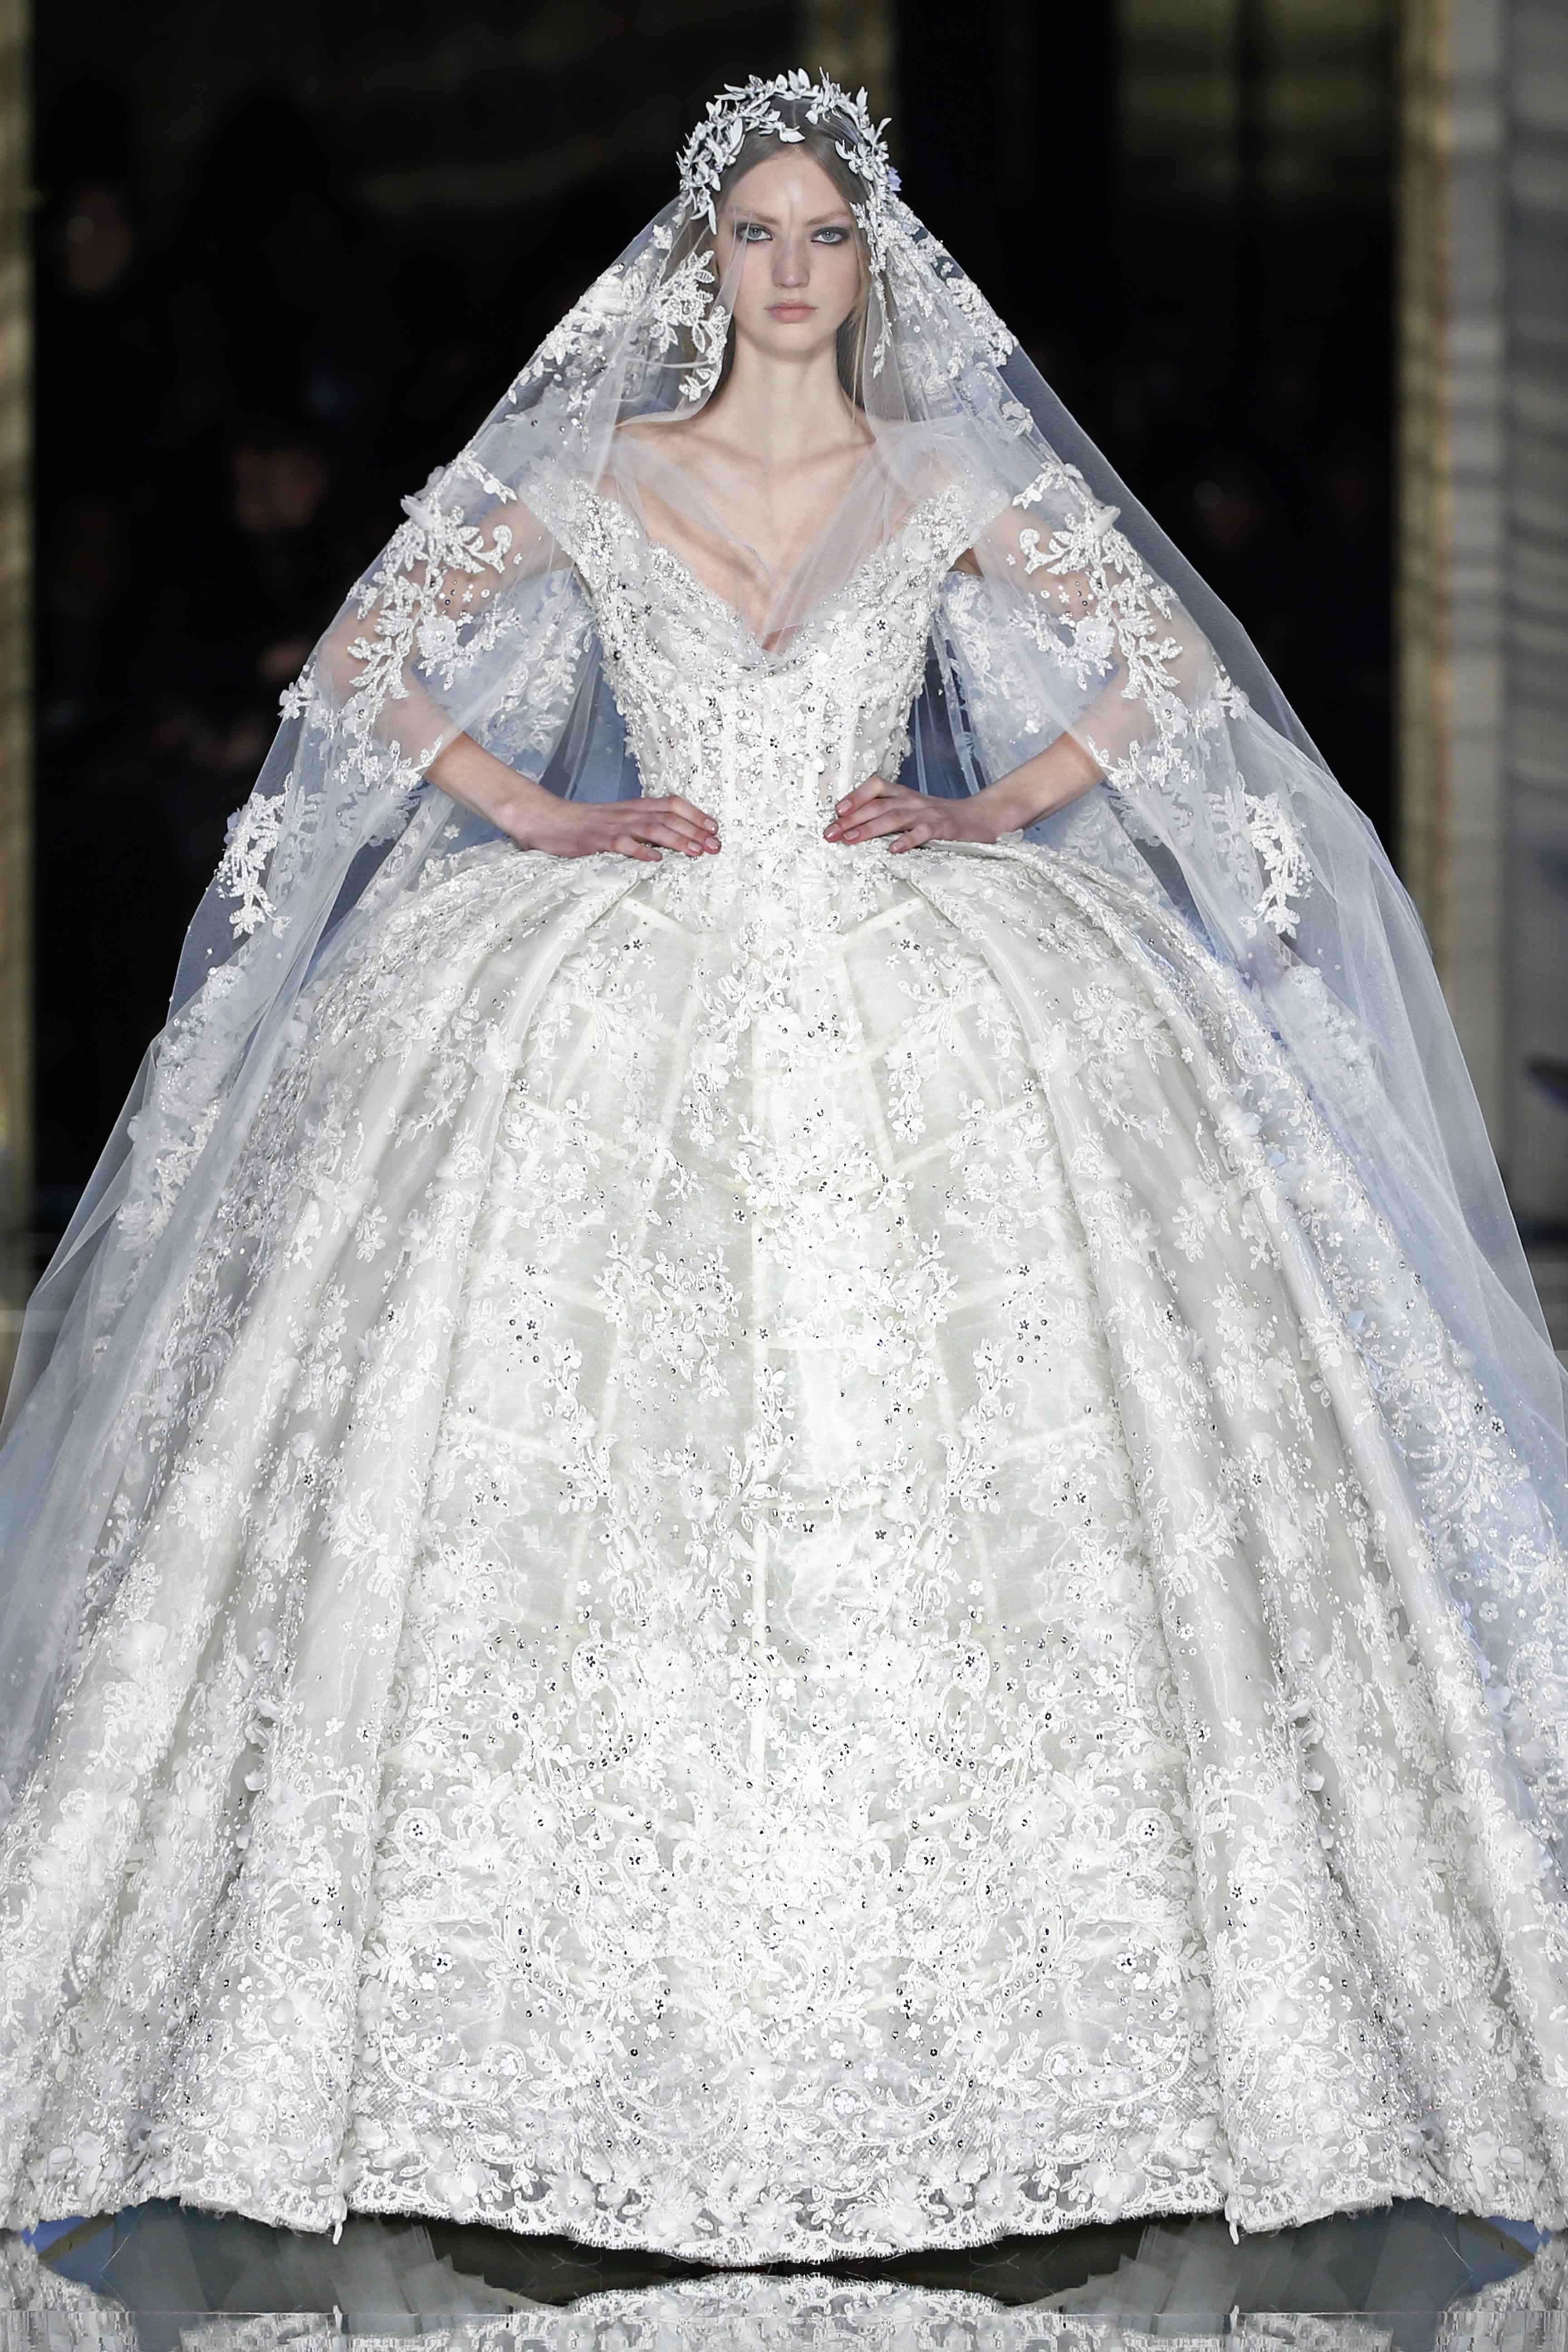 Couture bride 8 wedding dresses glamouria for Haute wedding